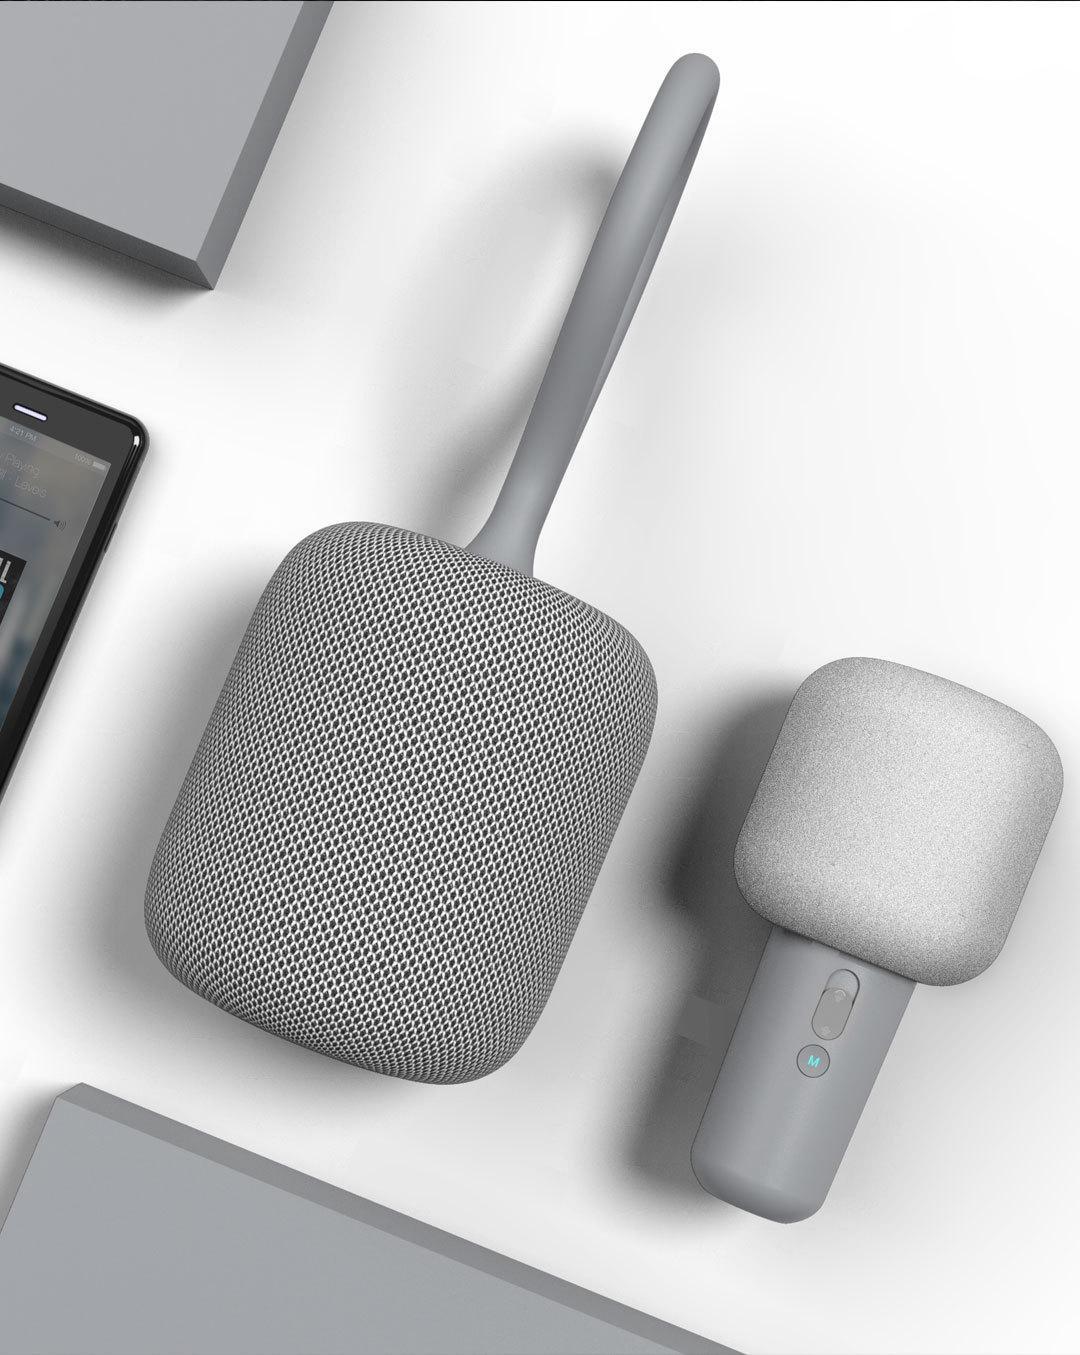 Bộ Micro Karaoke kèm loa kết nối bluetooth Xiaomi iK8 UL Life